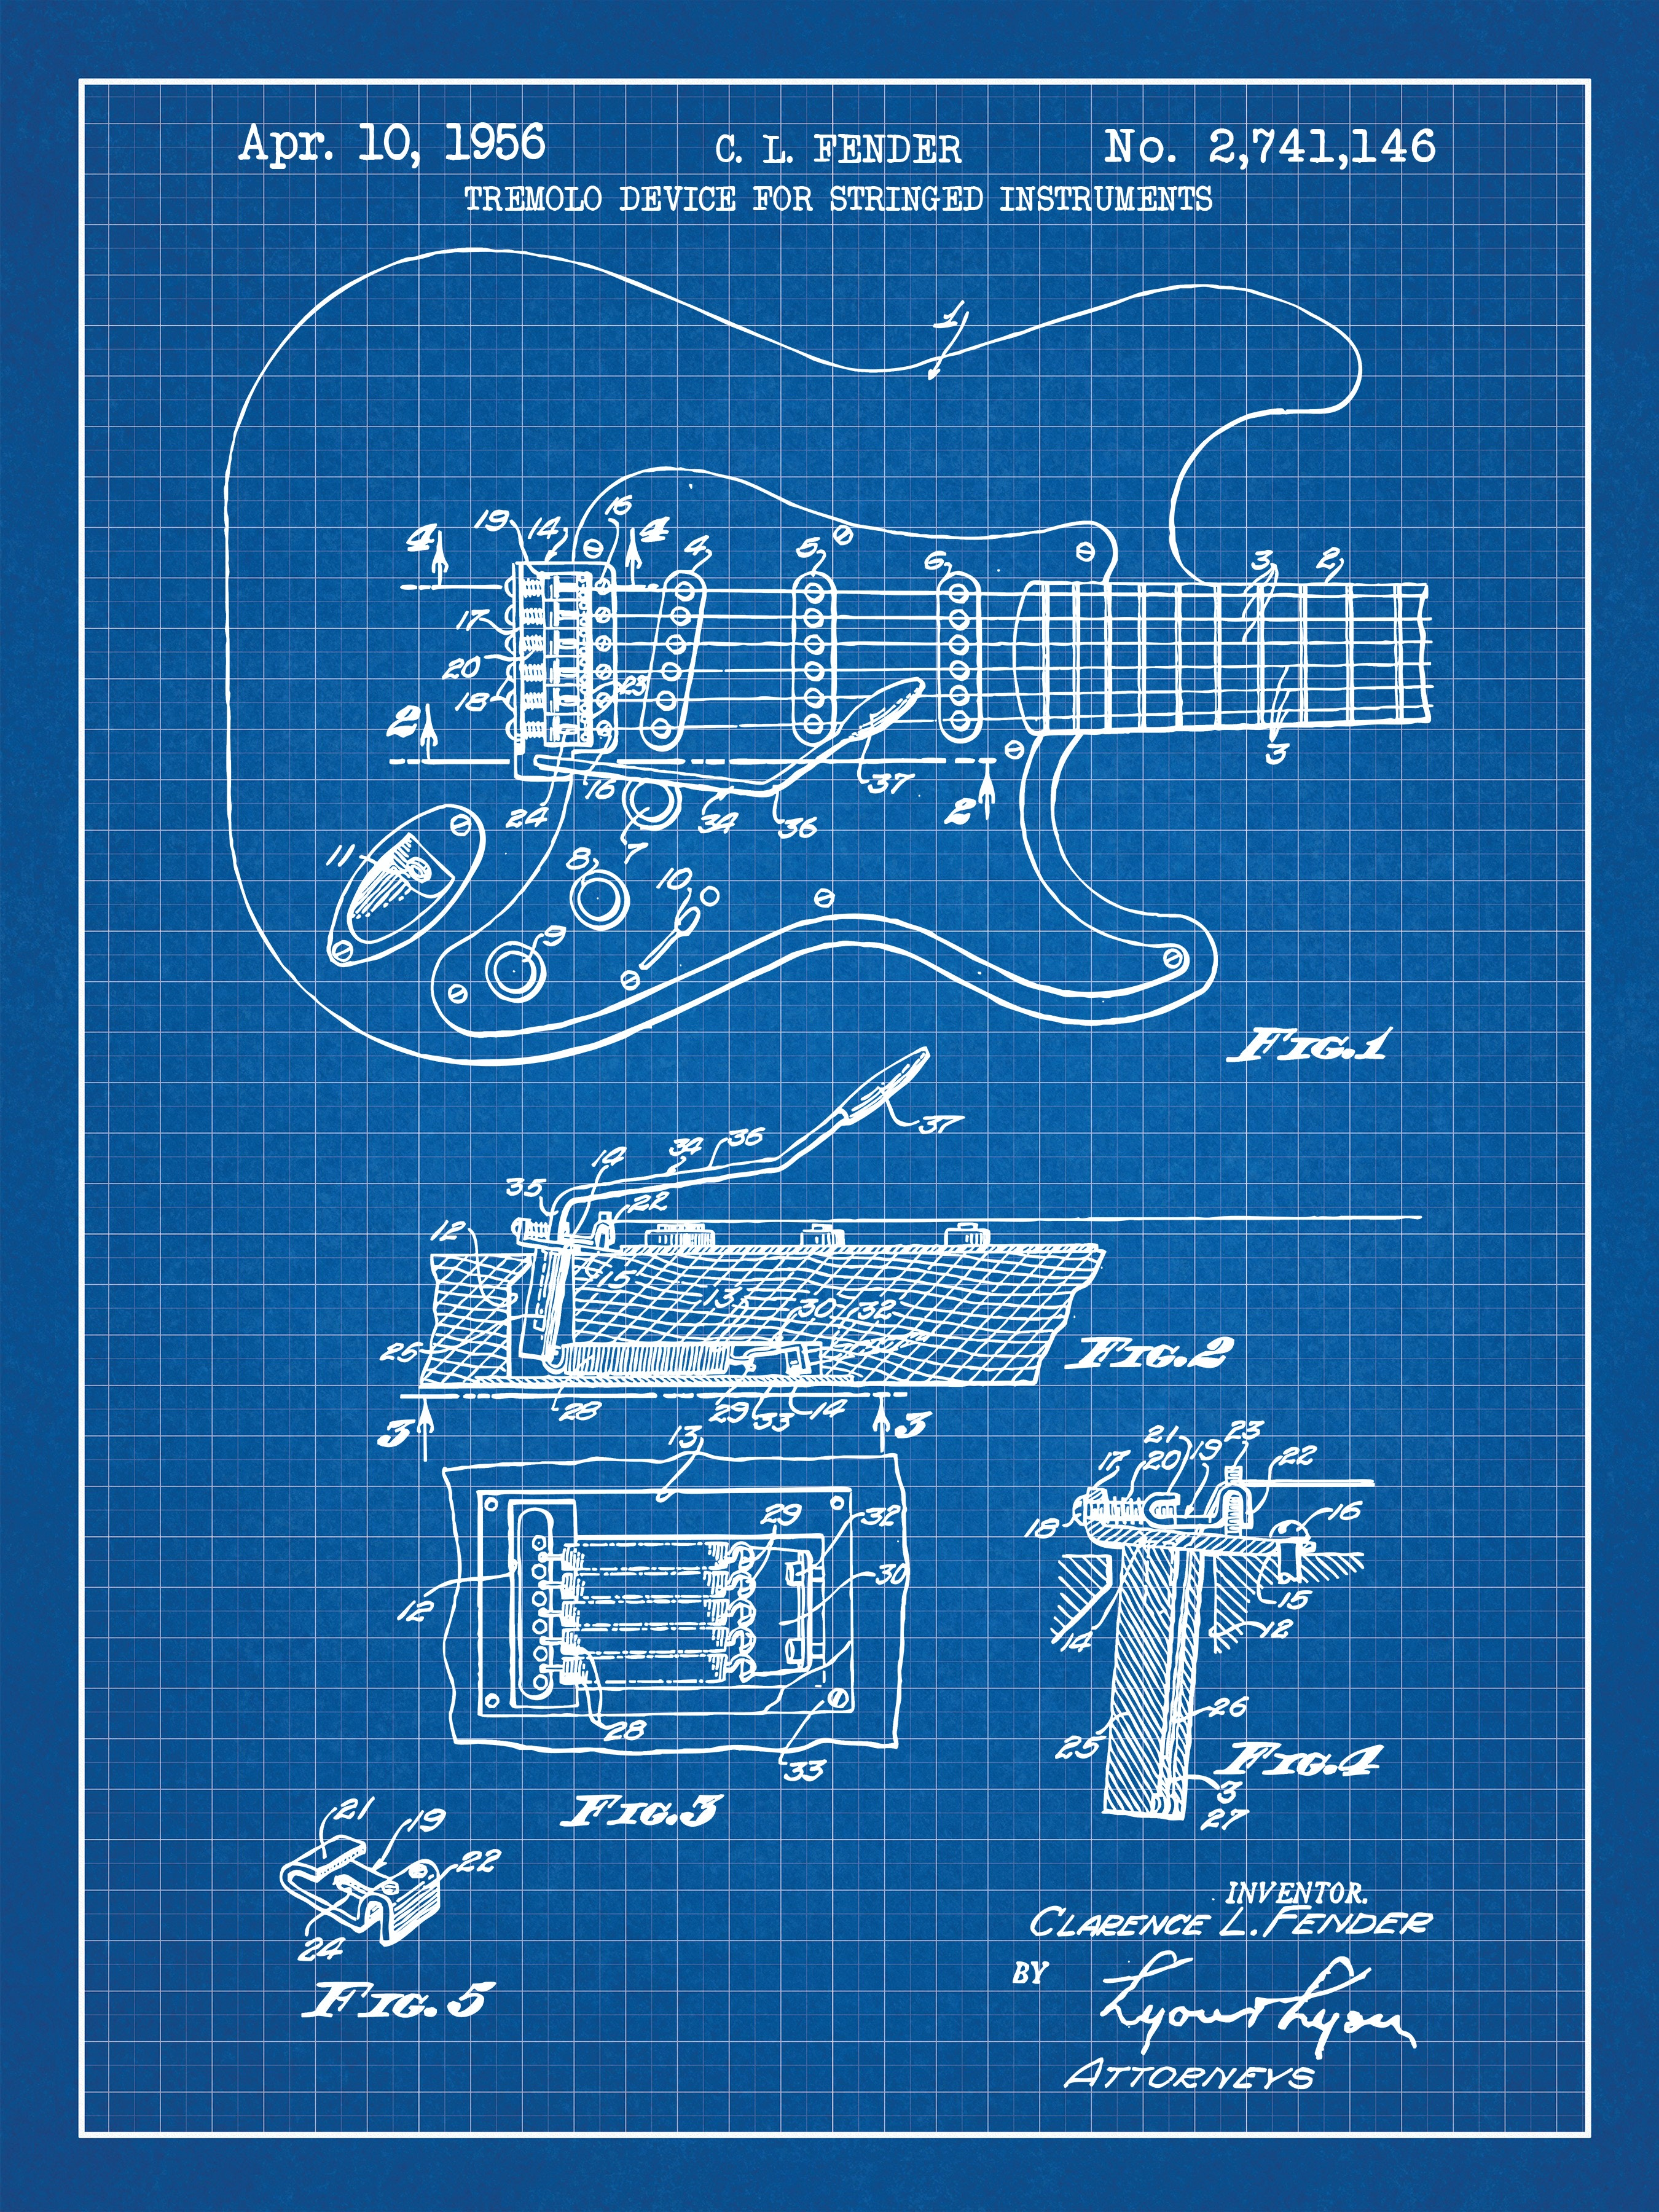 Fender Guitar - C.L. Fender - 1956 - 2,741,146